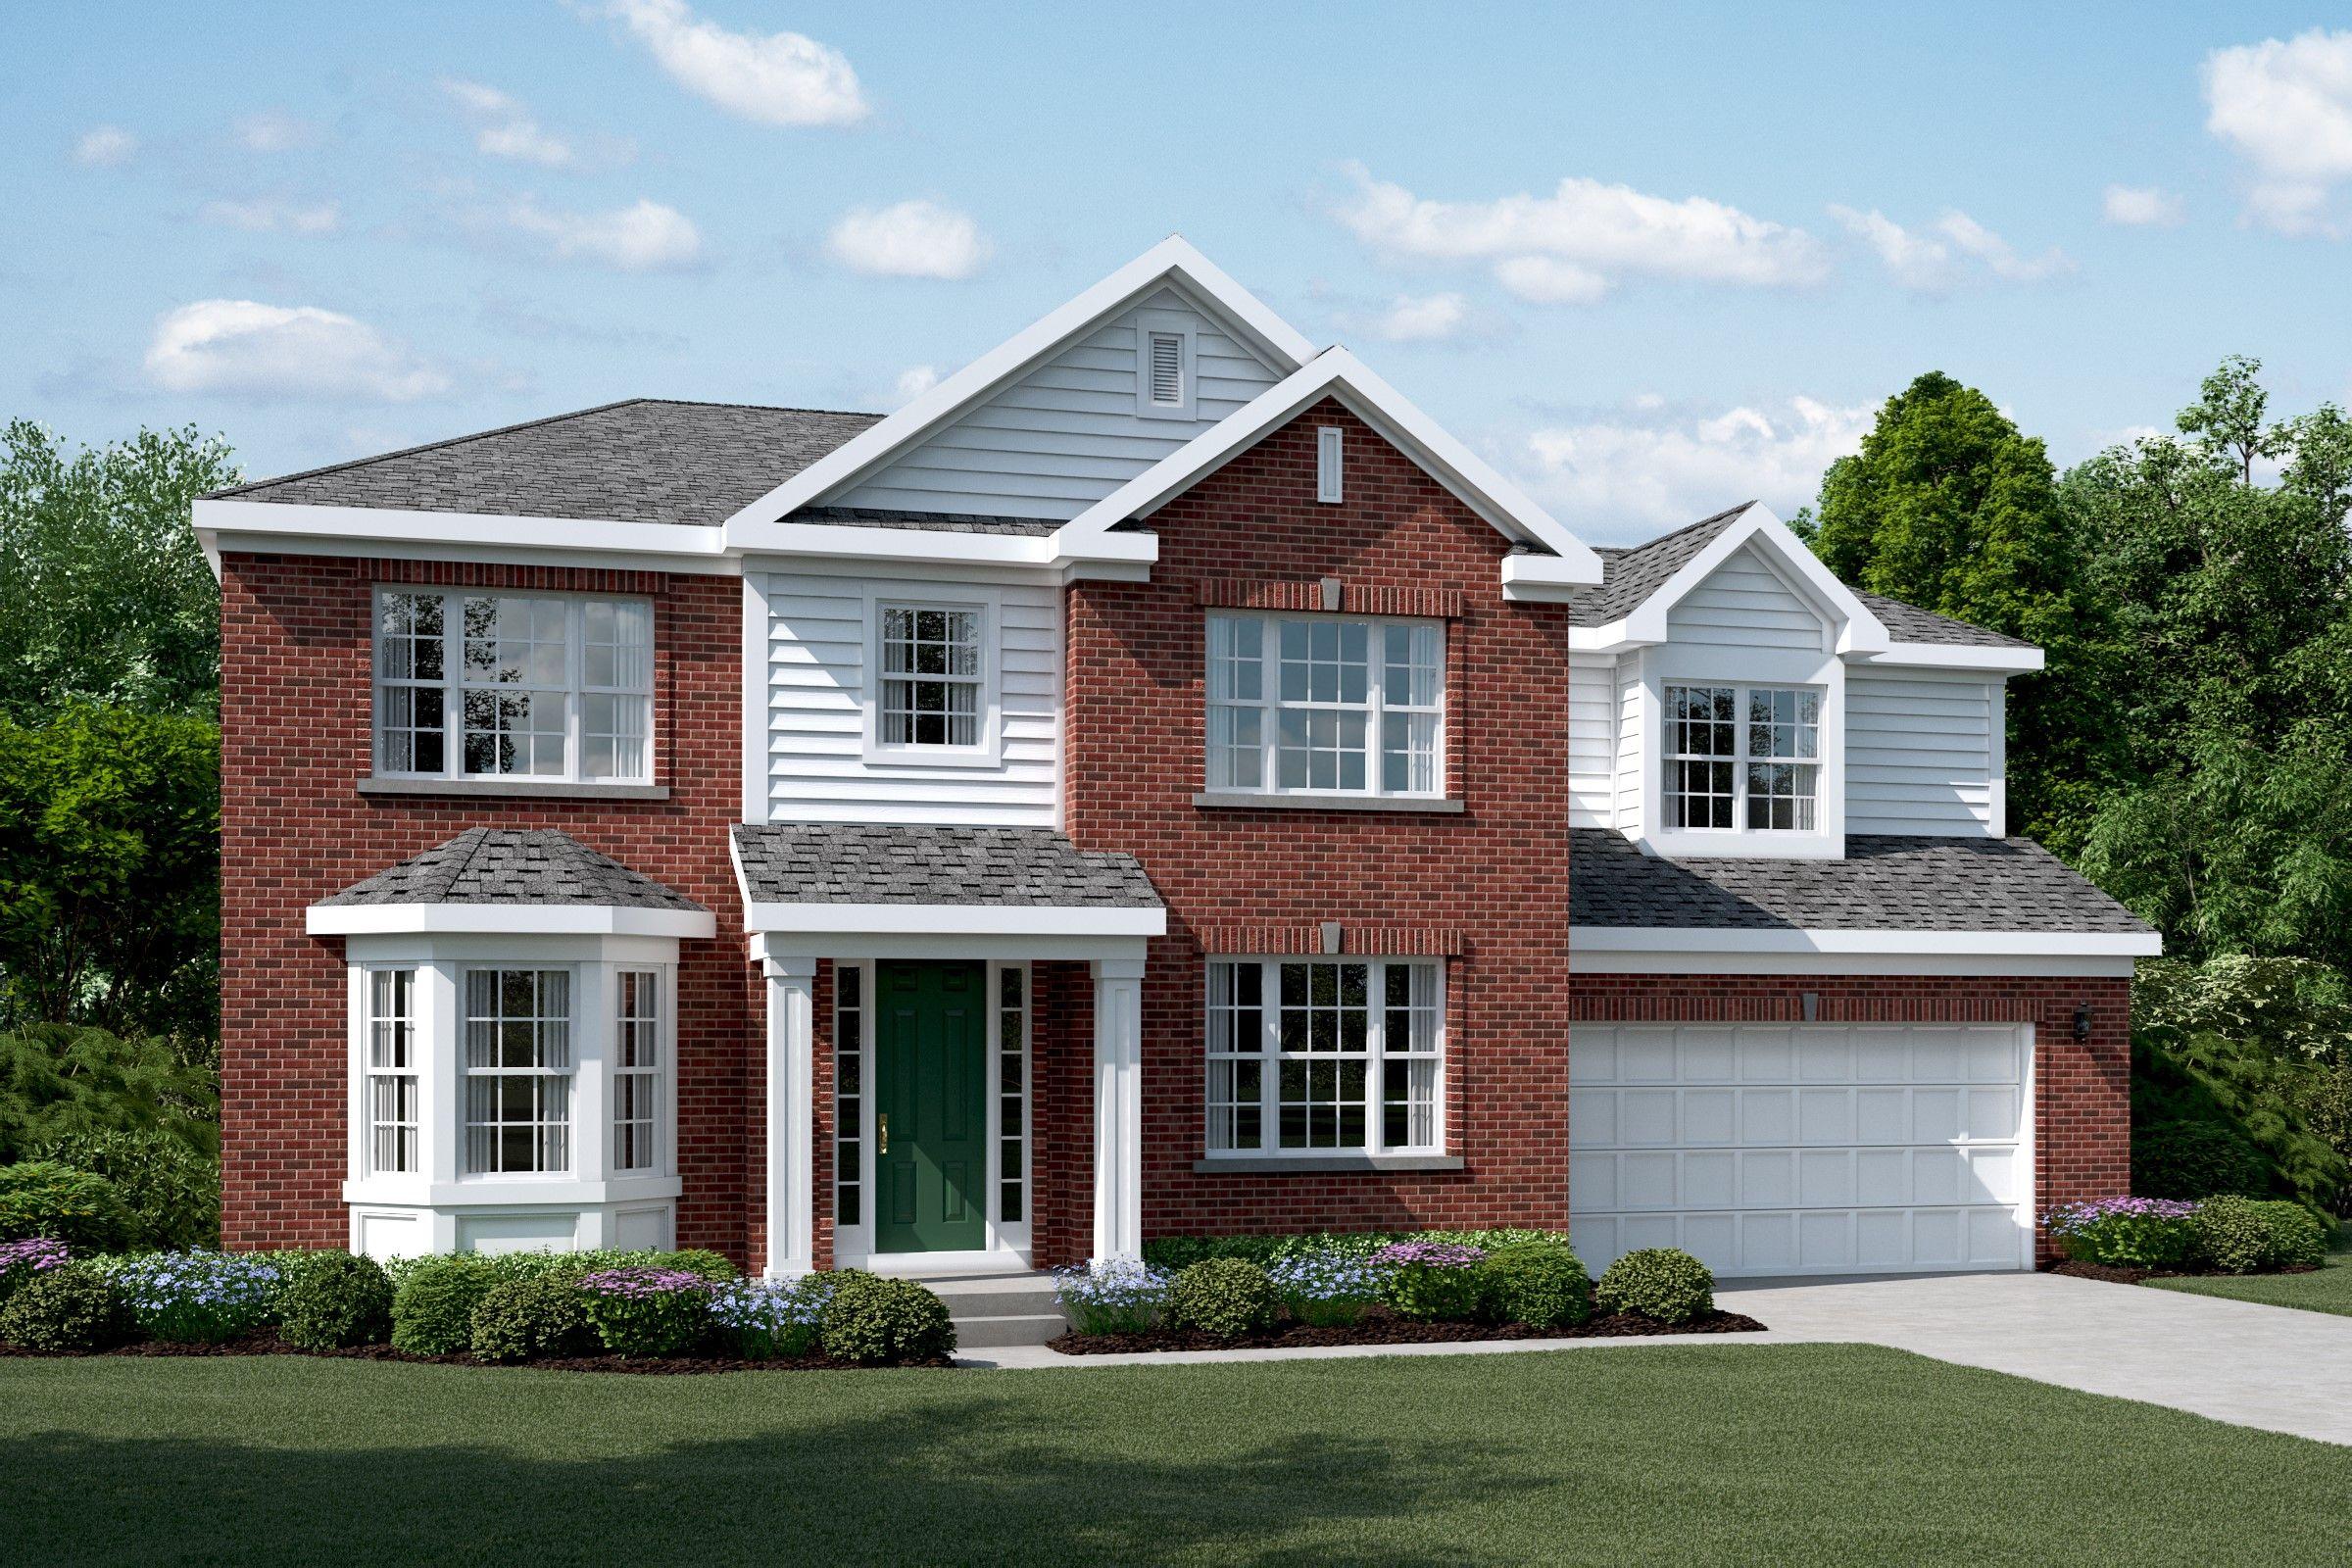 Single Family for Sale at Morton 1055 Northridge Ct., Homesite 12 Wheaton, Illinois 60187 United States